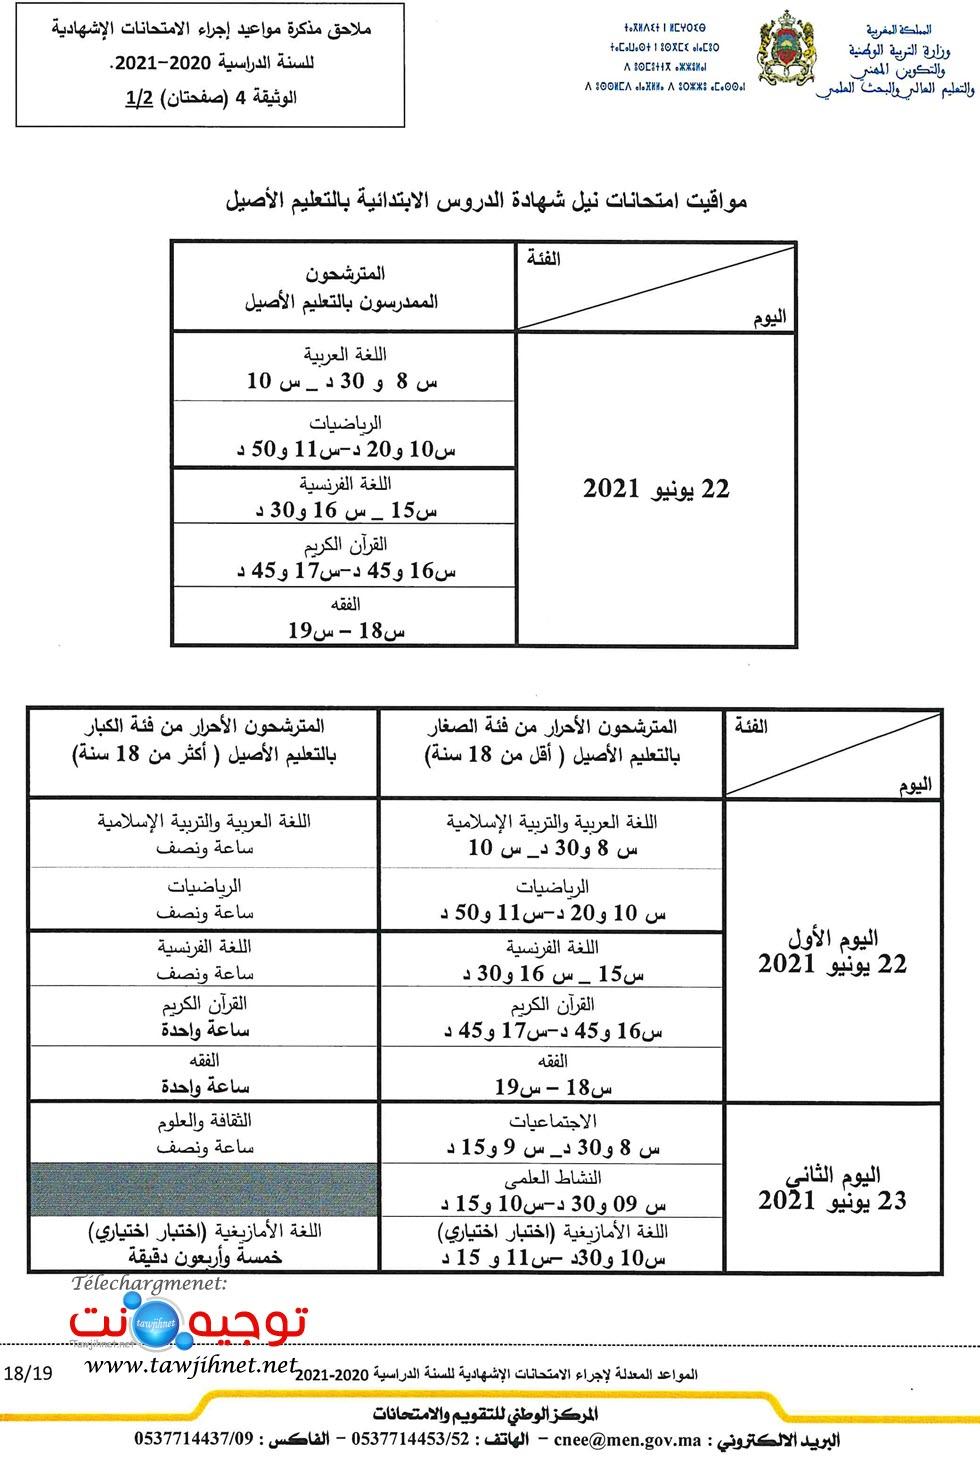 examen-2021-national-regional-provincial_Page_18.jpg